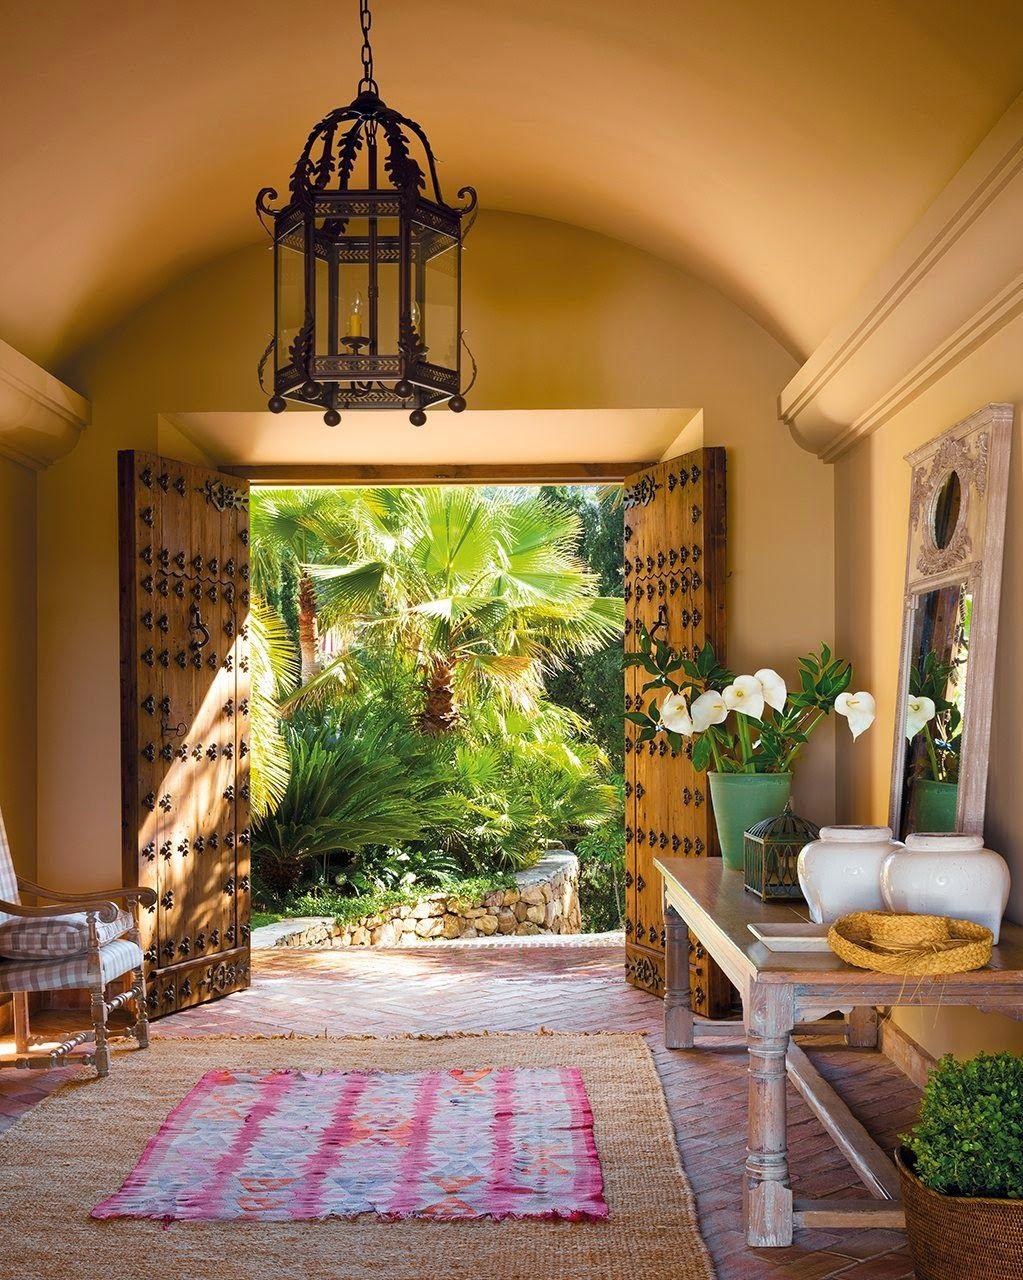 Blog de decoraci n dise o de interiores ideas decorativas tendencias y estilo dise os de - Camino a casa decoracion ...